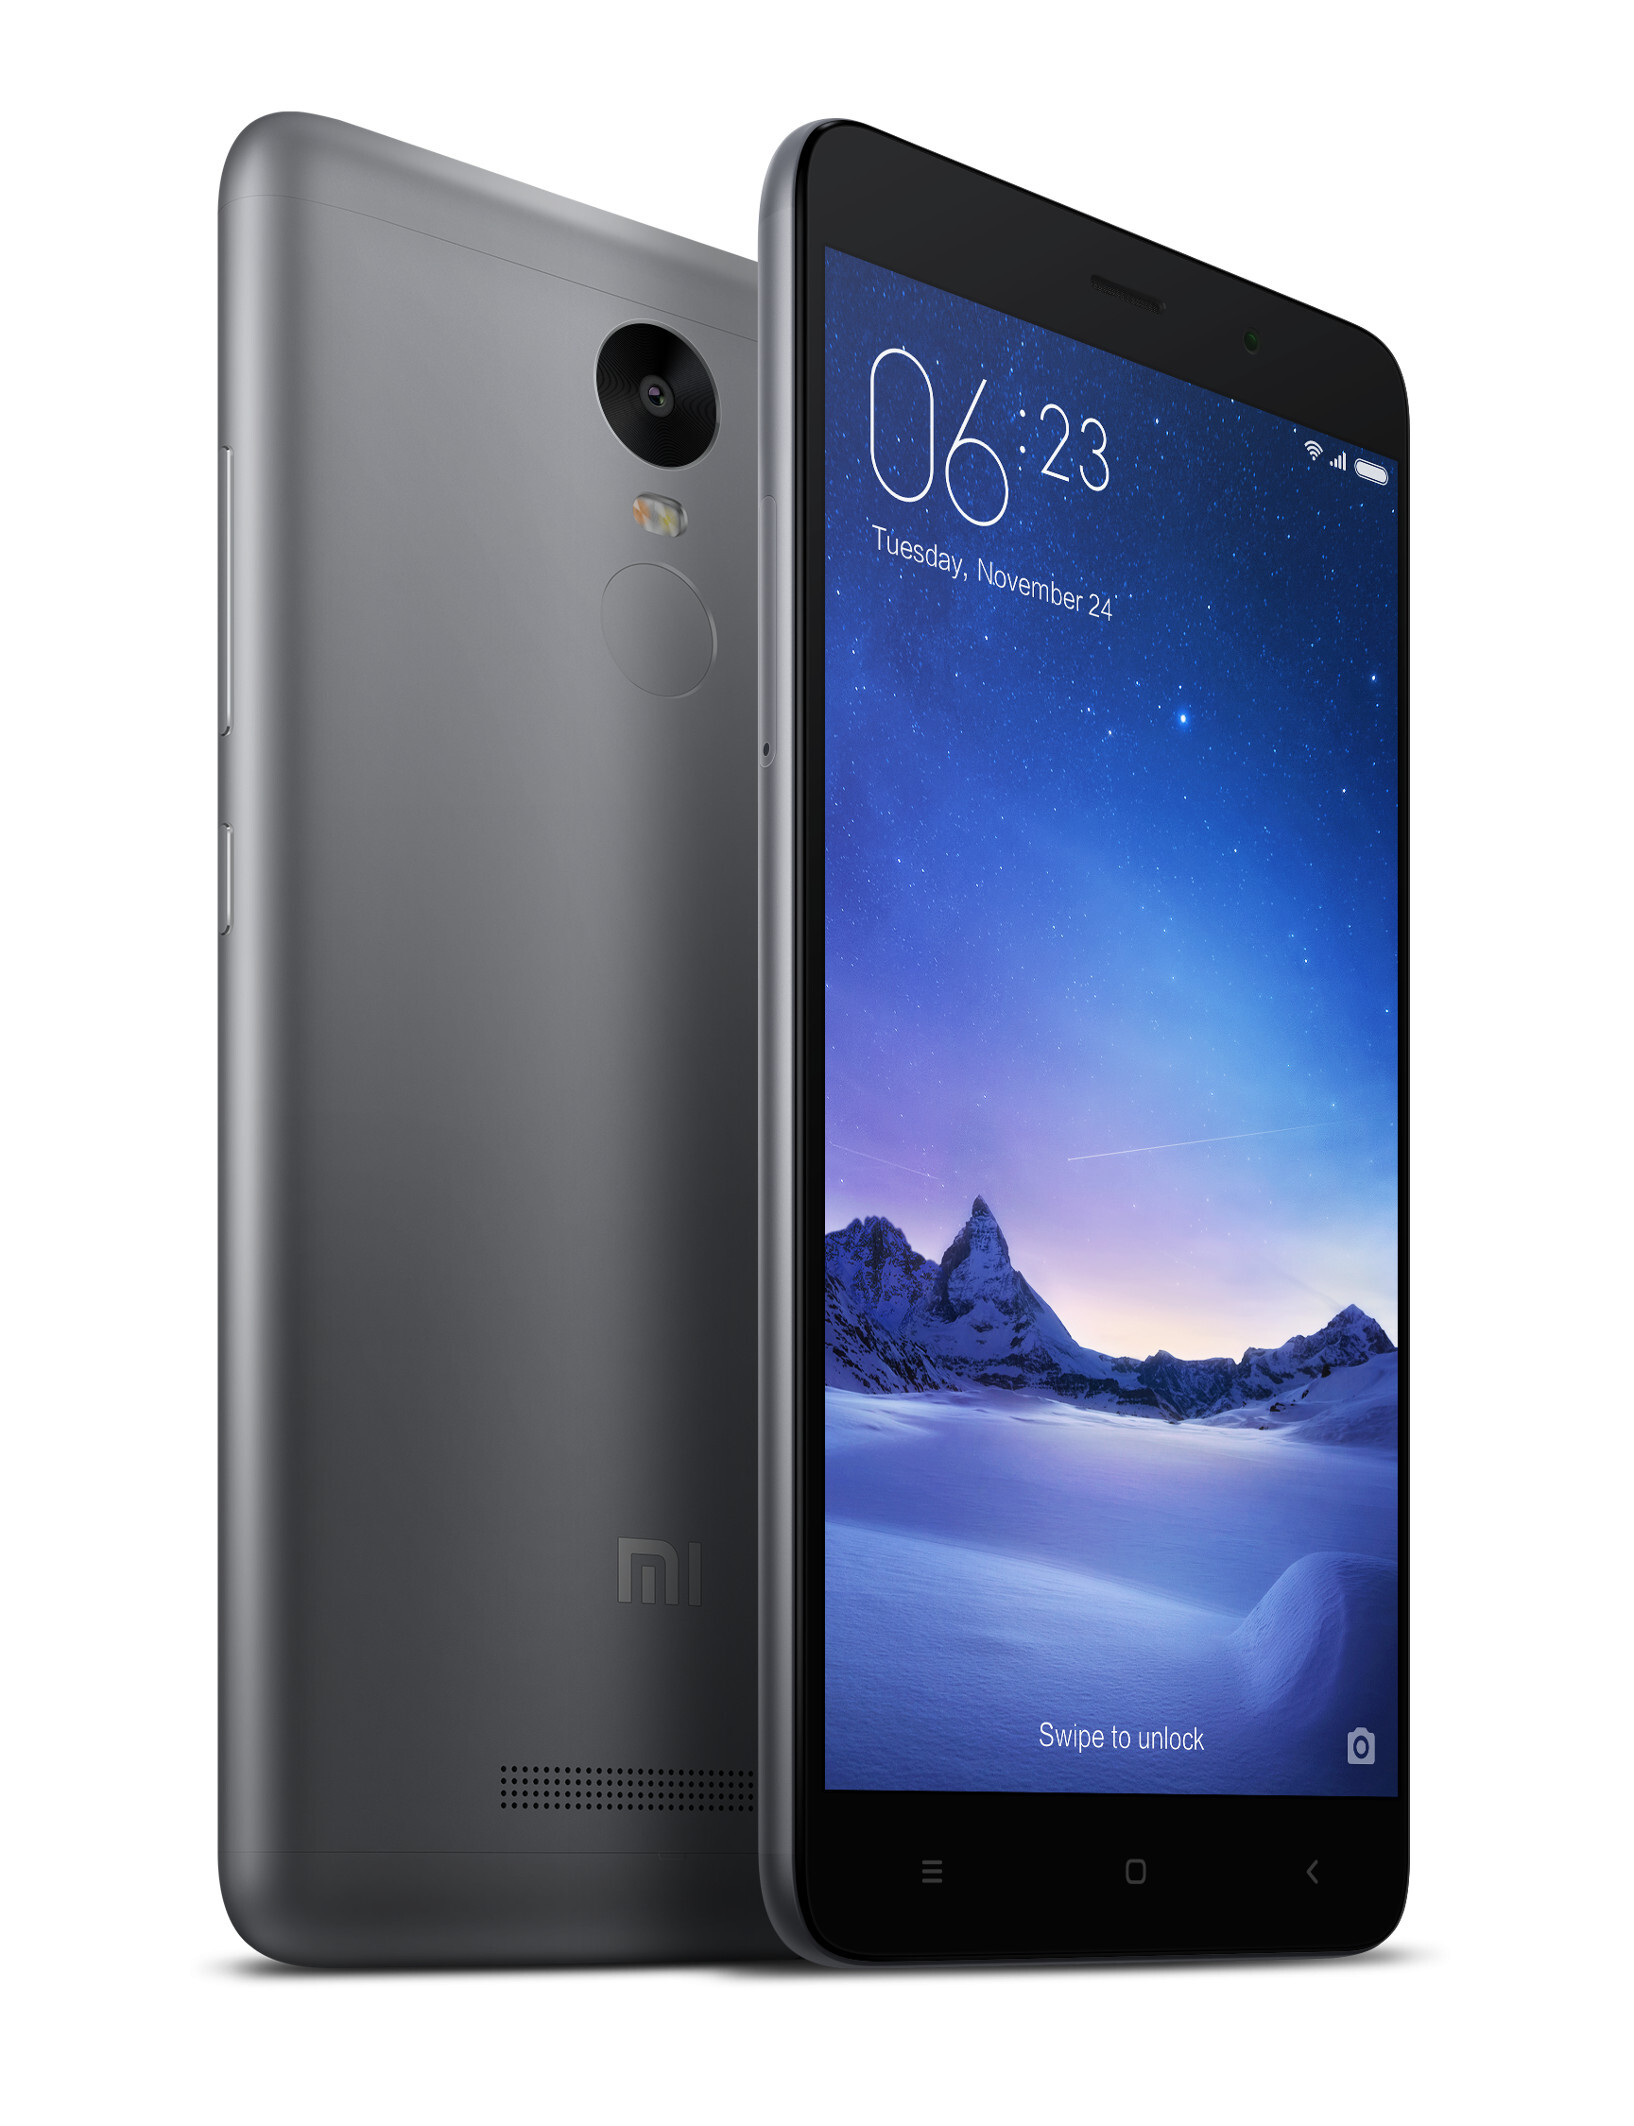 Xiaomi Redmi Note 3 Specs